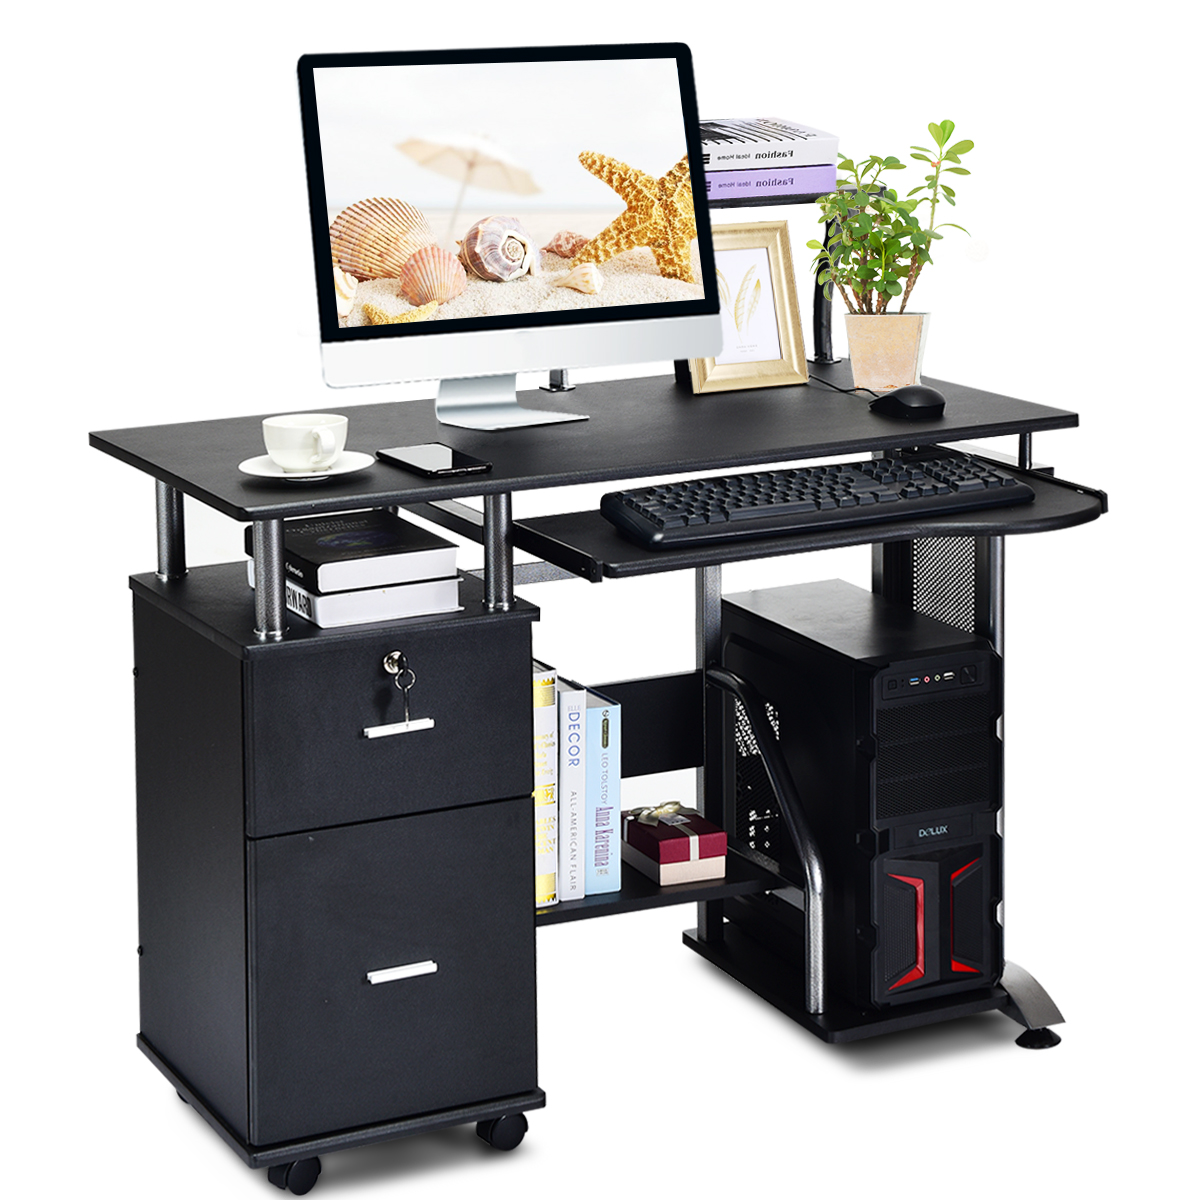 Costway Computer Desk PC Laptop Table WorkStation Home Office Furniture W/ Printer Shelf